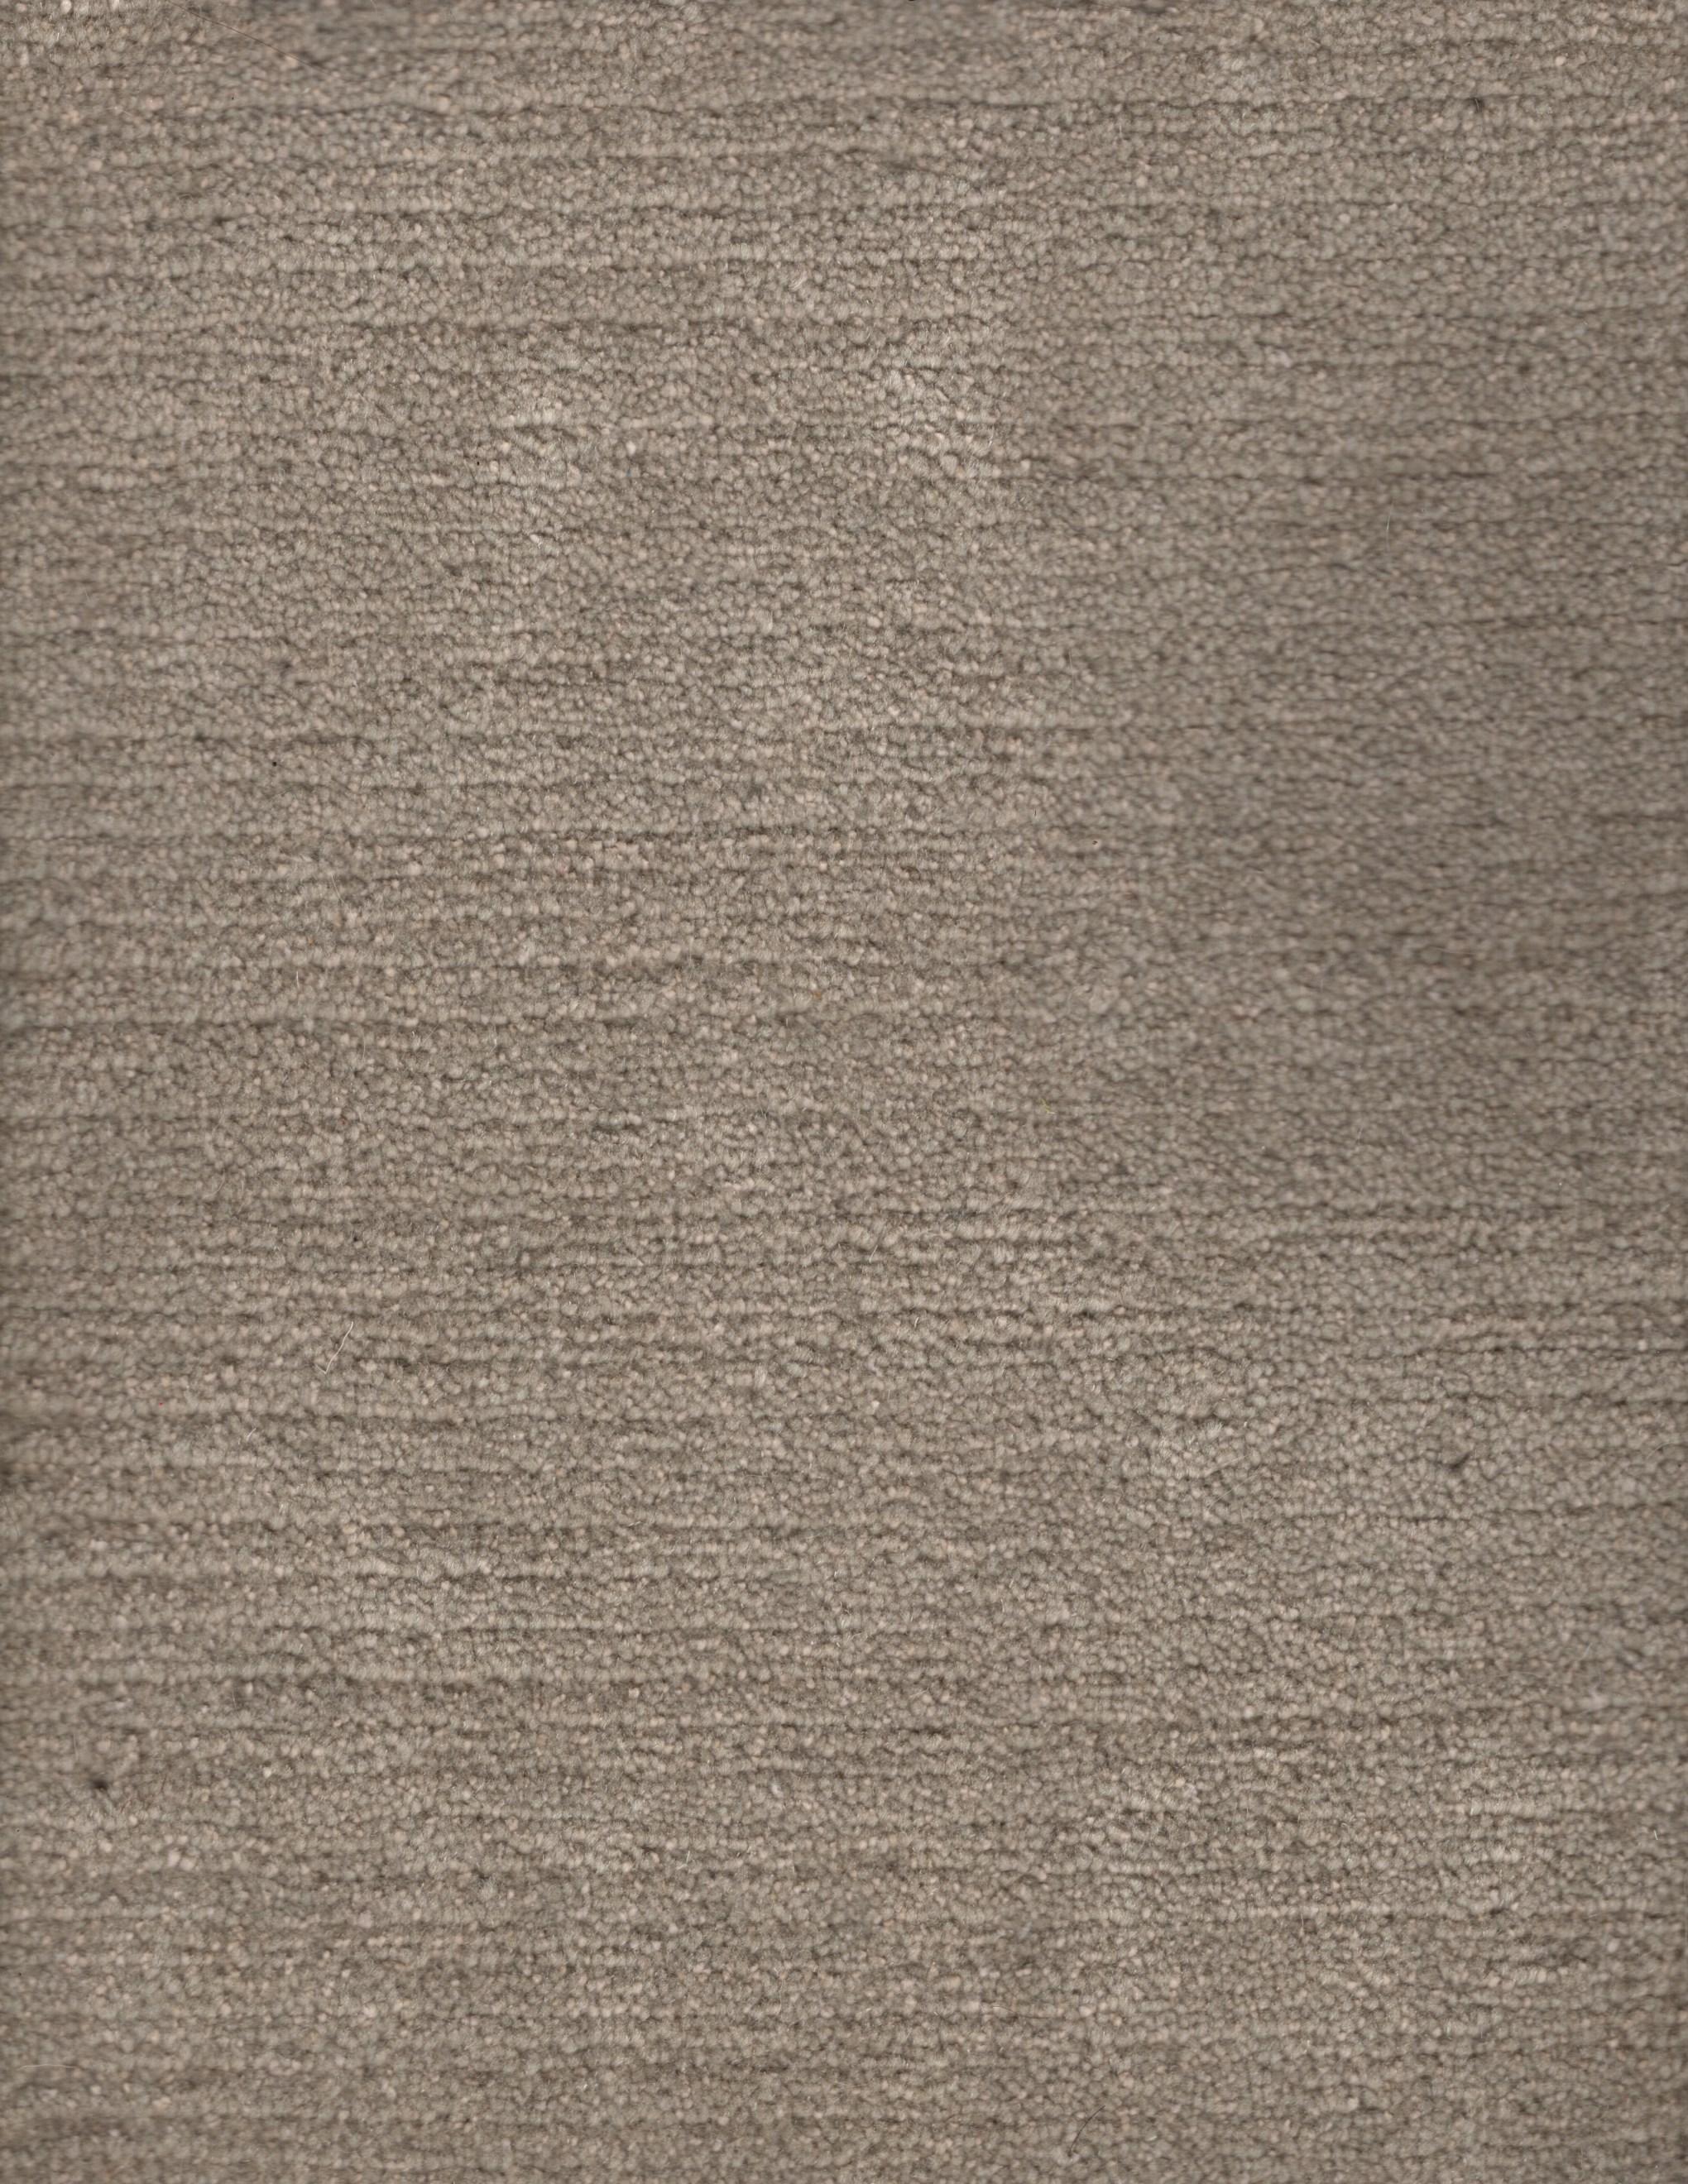 80 Knot Wool 101510